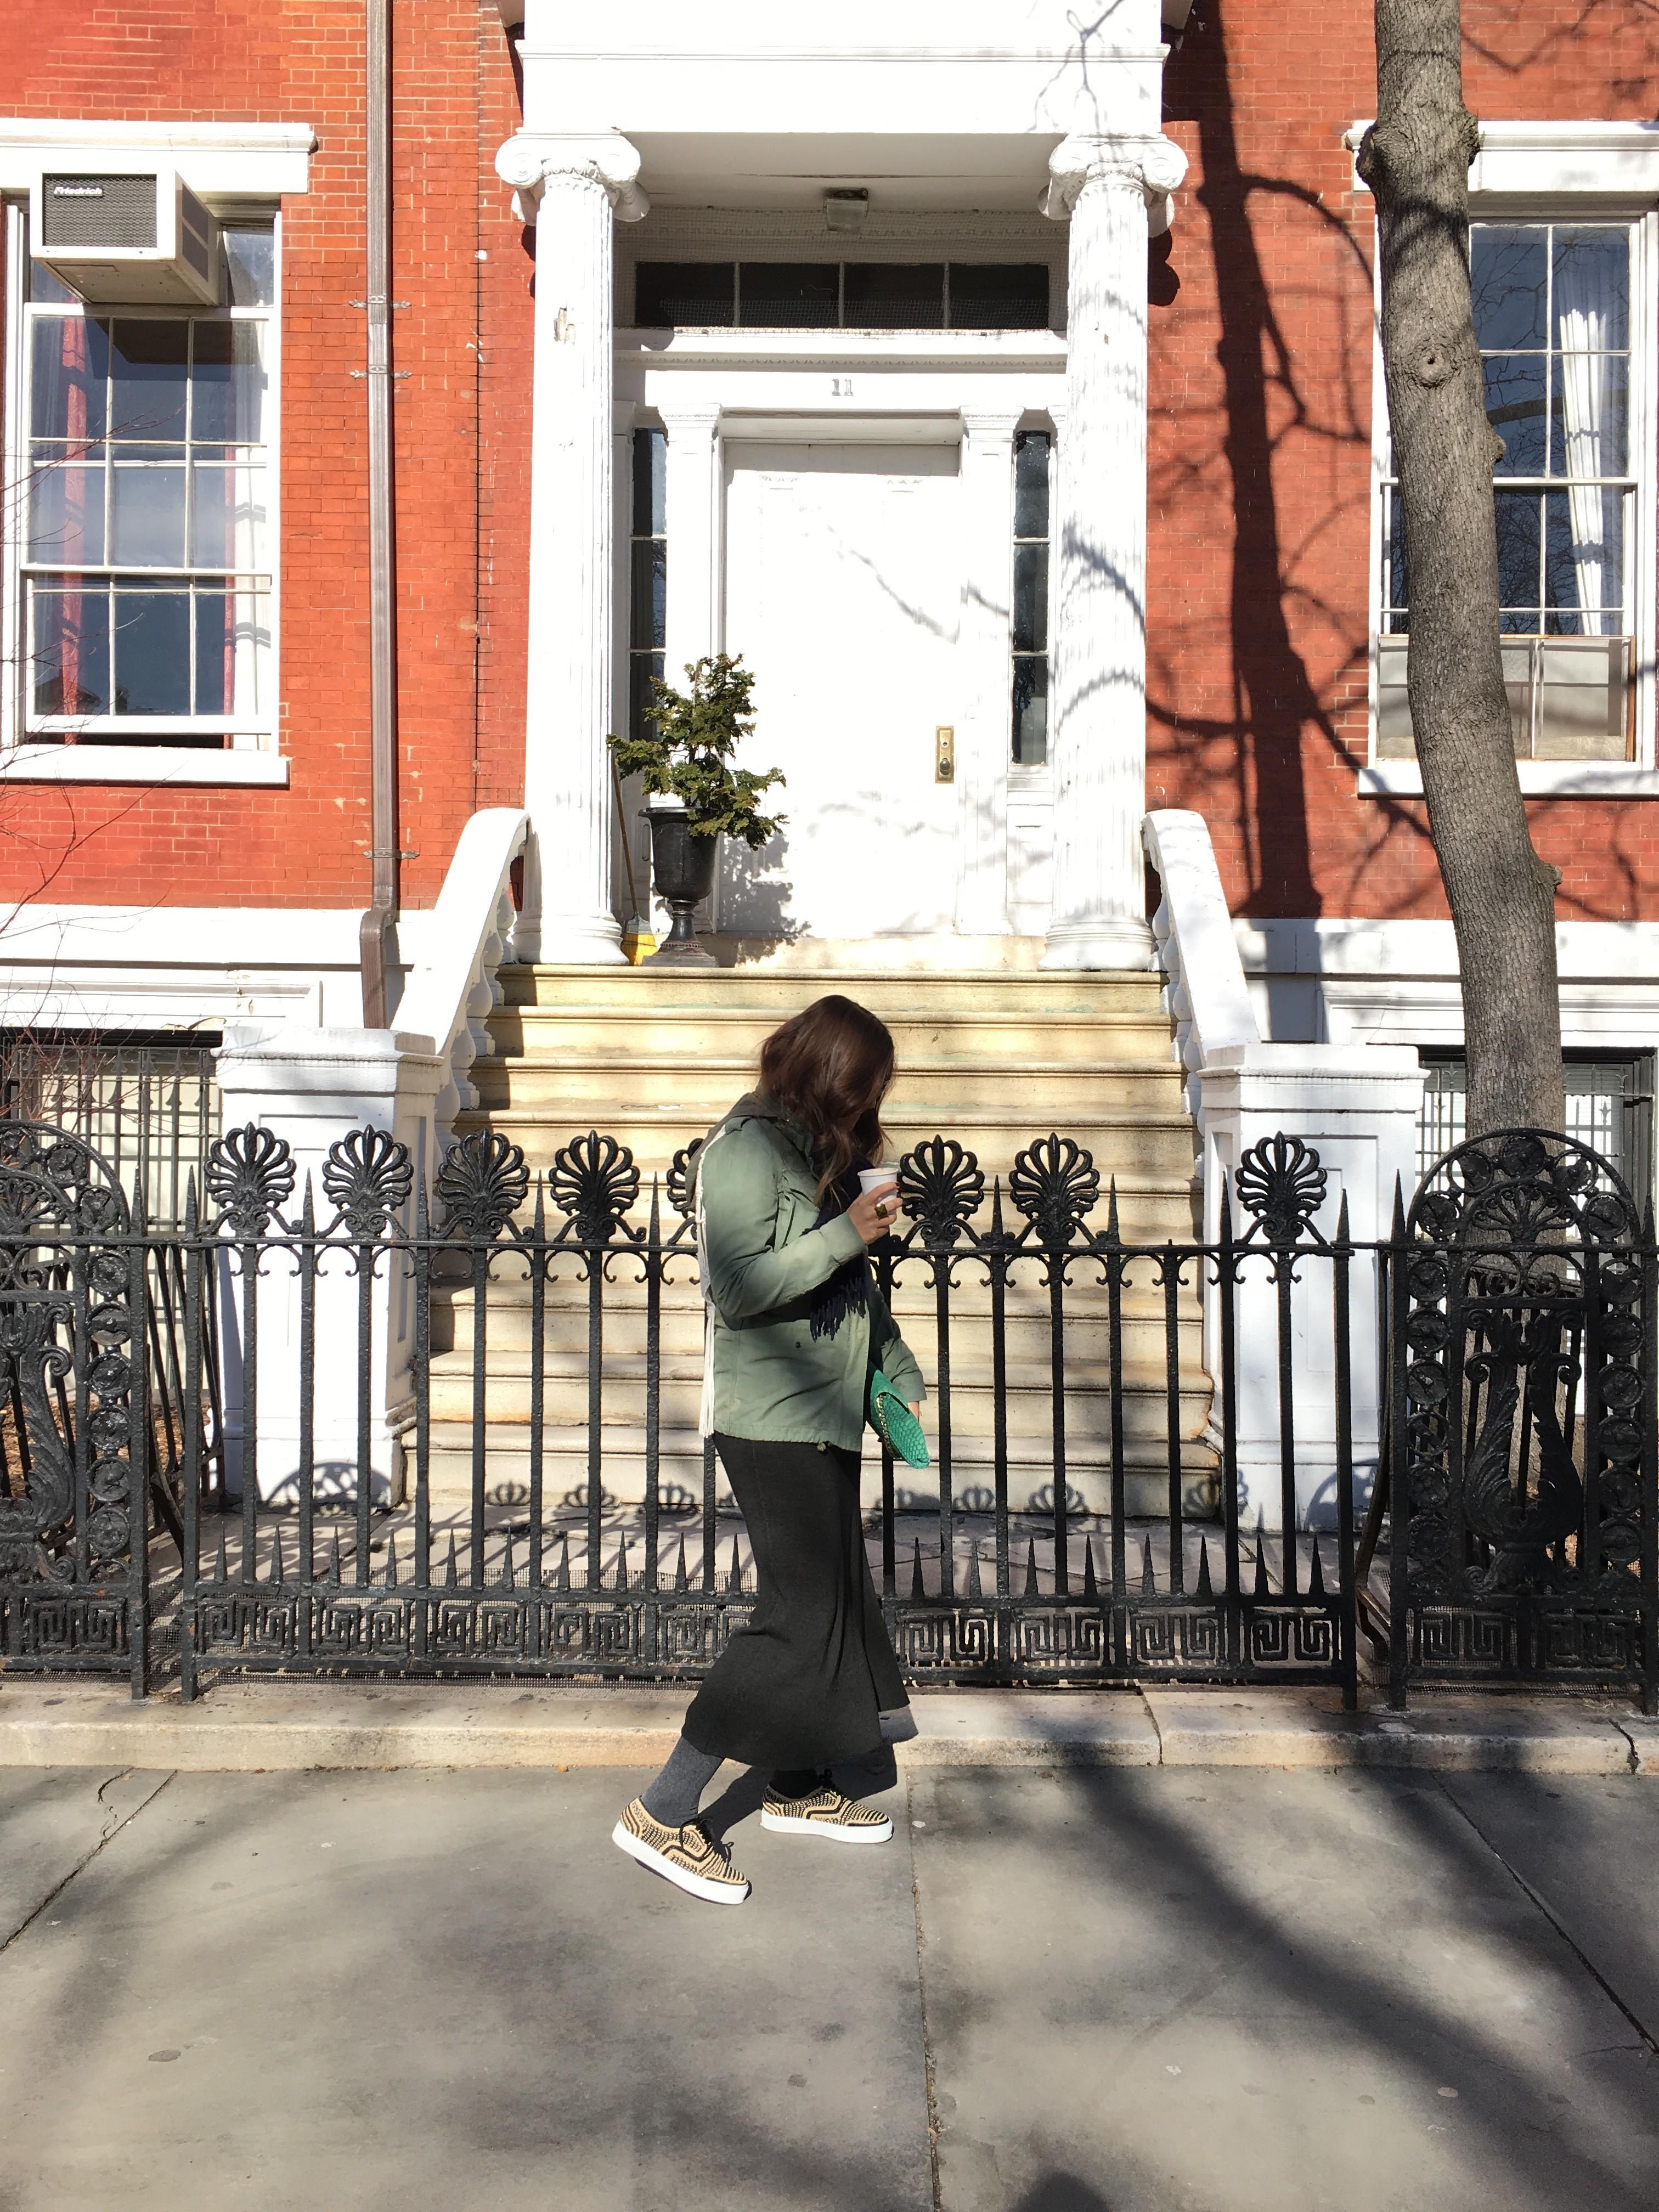 casul_chic_dress_looks_alley_girl_new_york_fashion_blog6